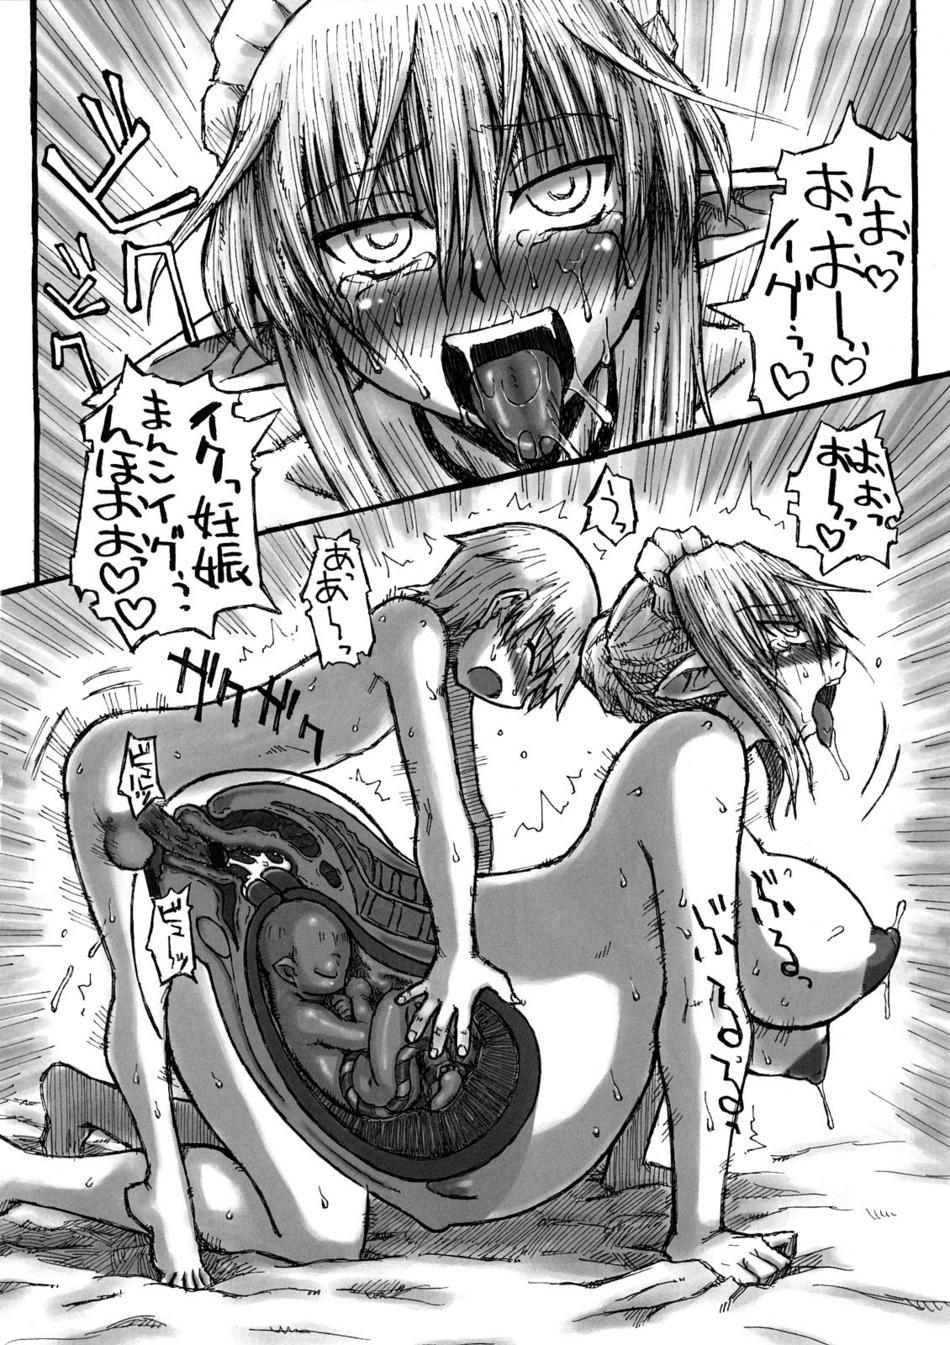 Hentai manga photo story hentai images